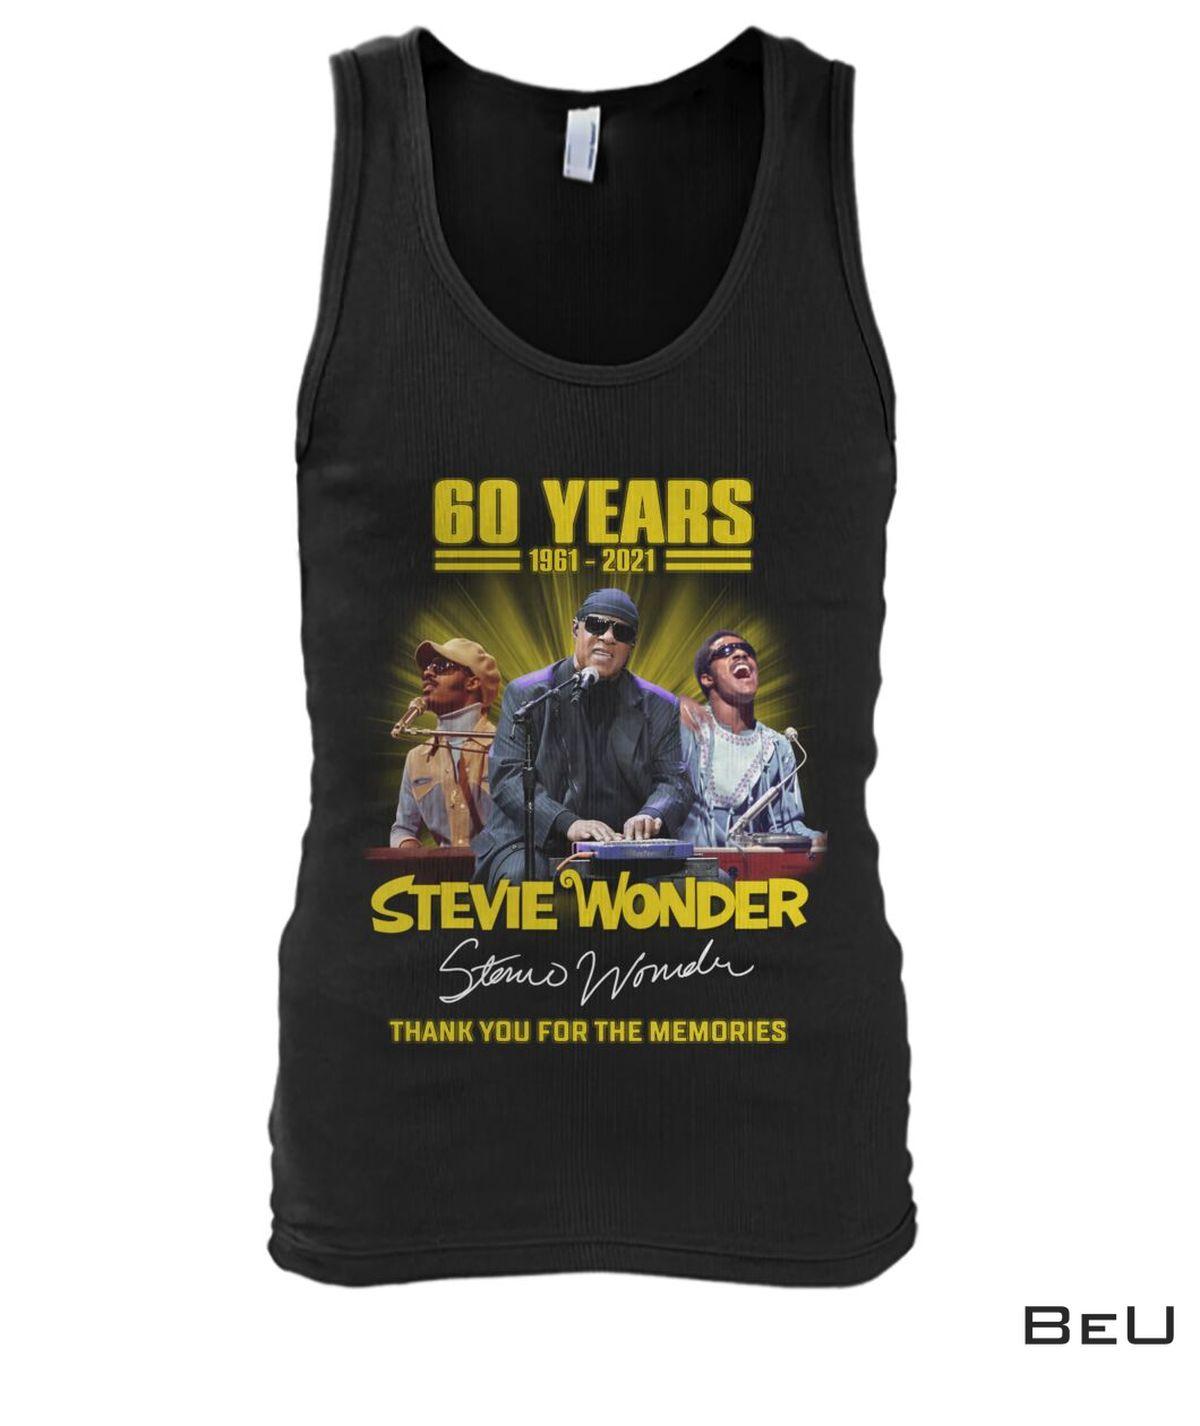 Best Stevie Wonder 60 Years Thank You For The Memories Shirt, hoodie, tank top